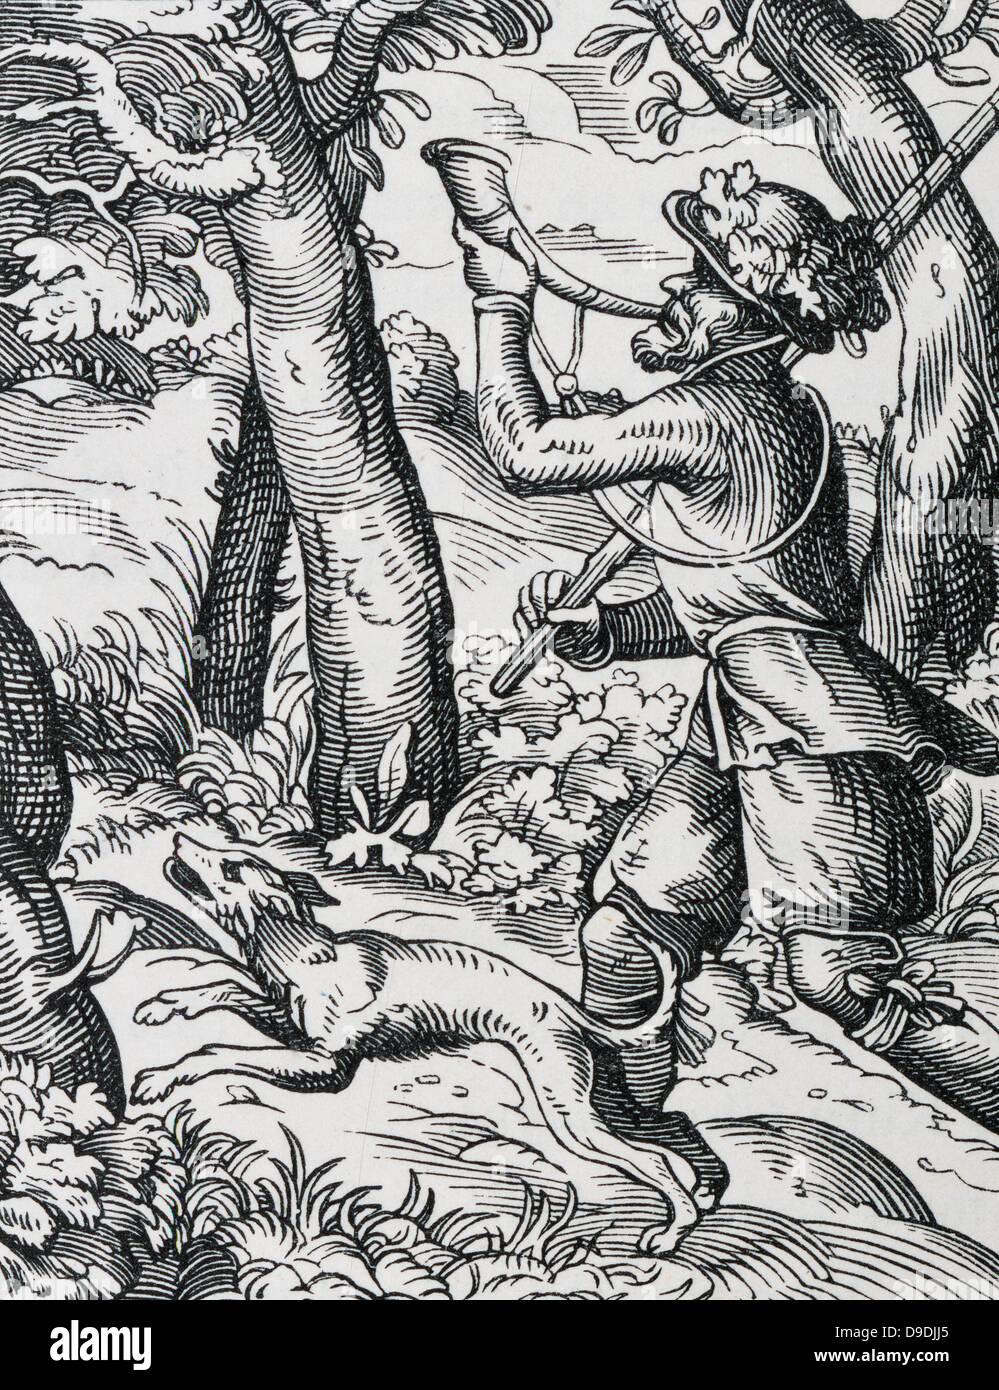 The Huntsman. 16th century woodcut by Jost Amman. - Stock Image